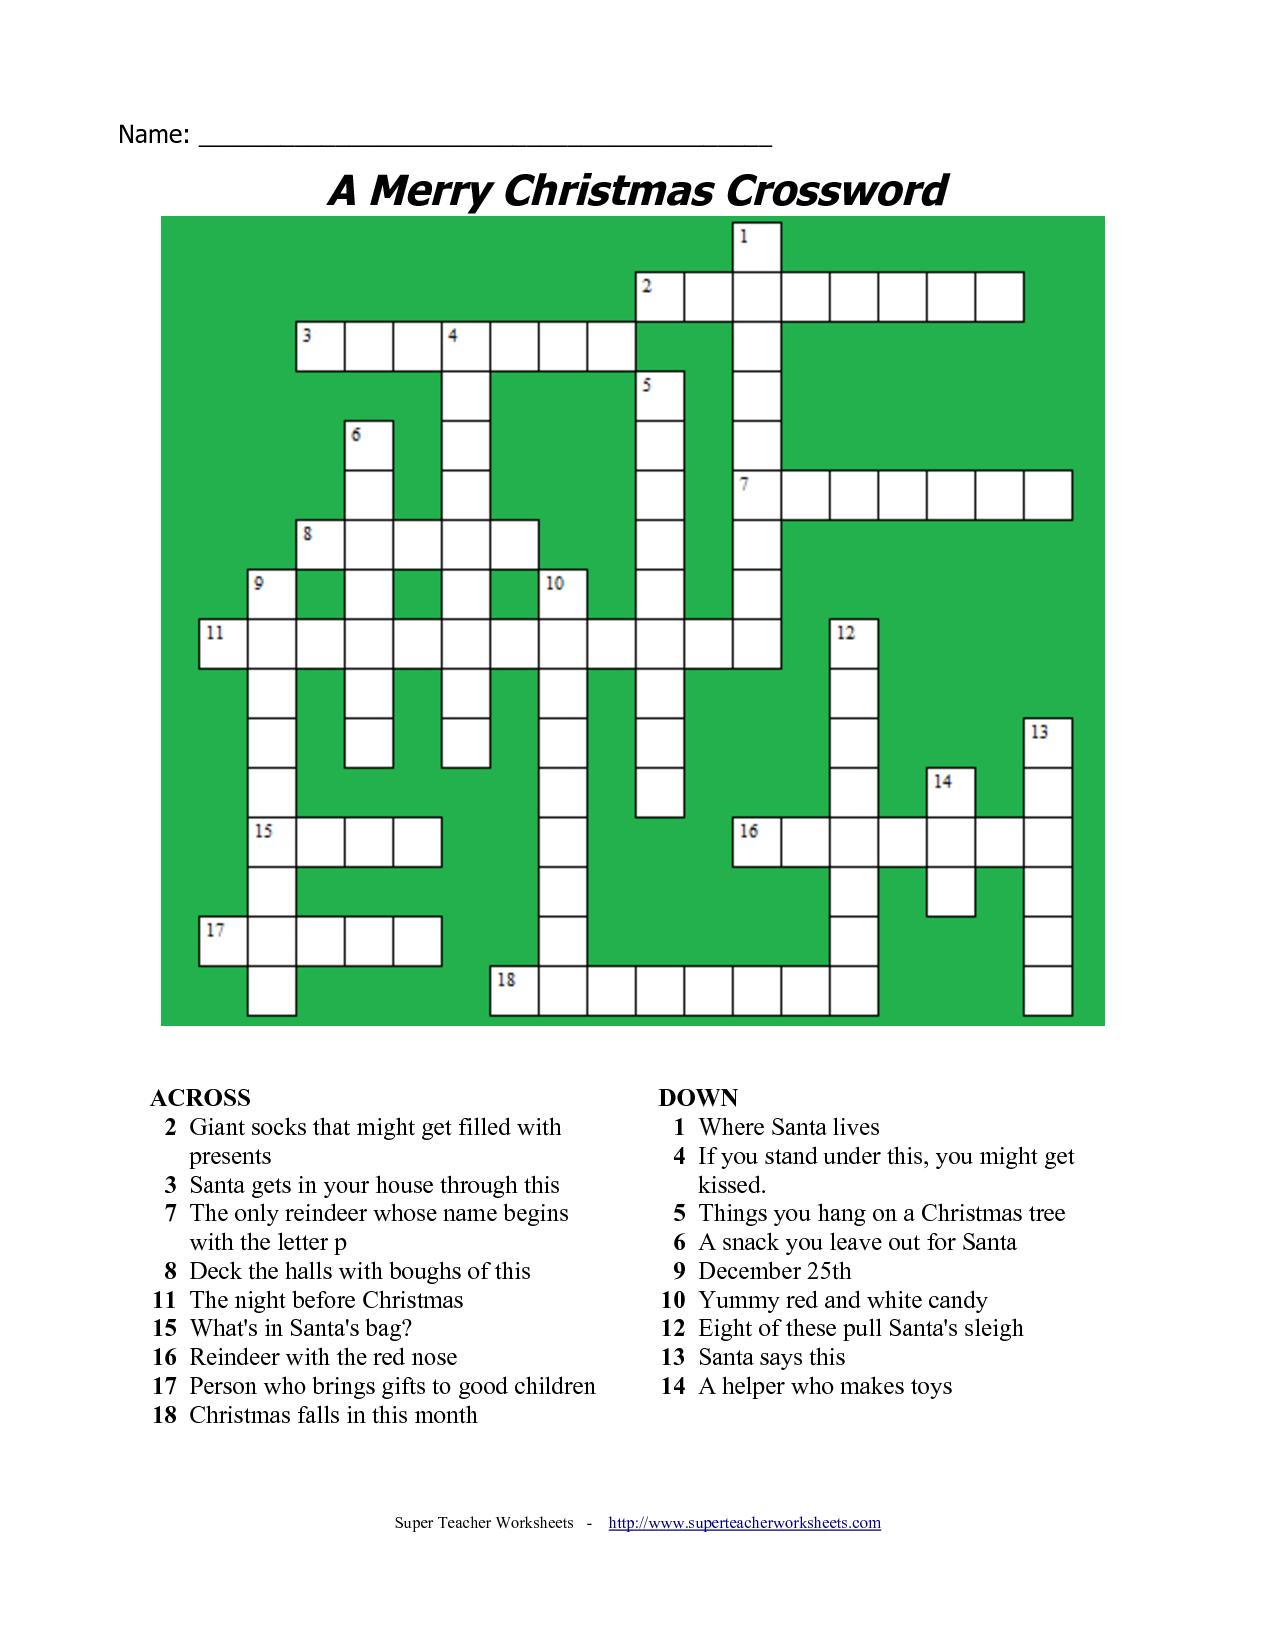 20 Fun Printable Christmas Crossword Puzzles | Kittybabylove - Printable Children's Crossword Puzzles